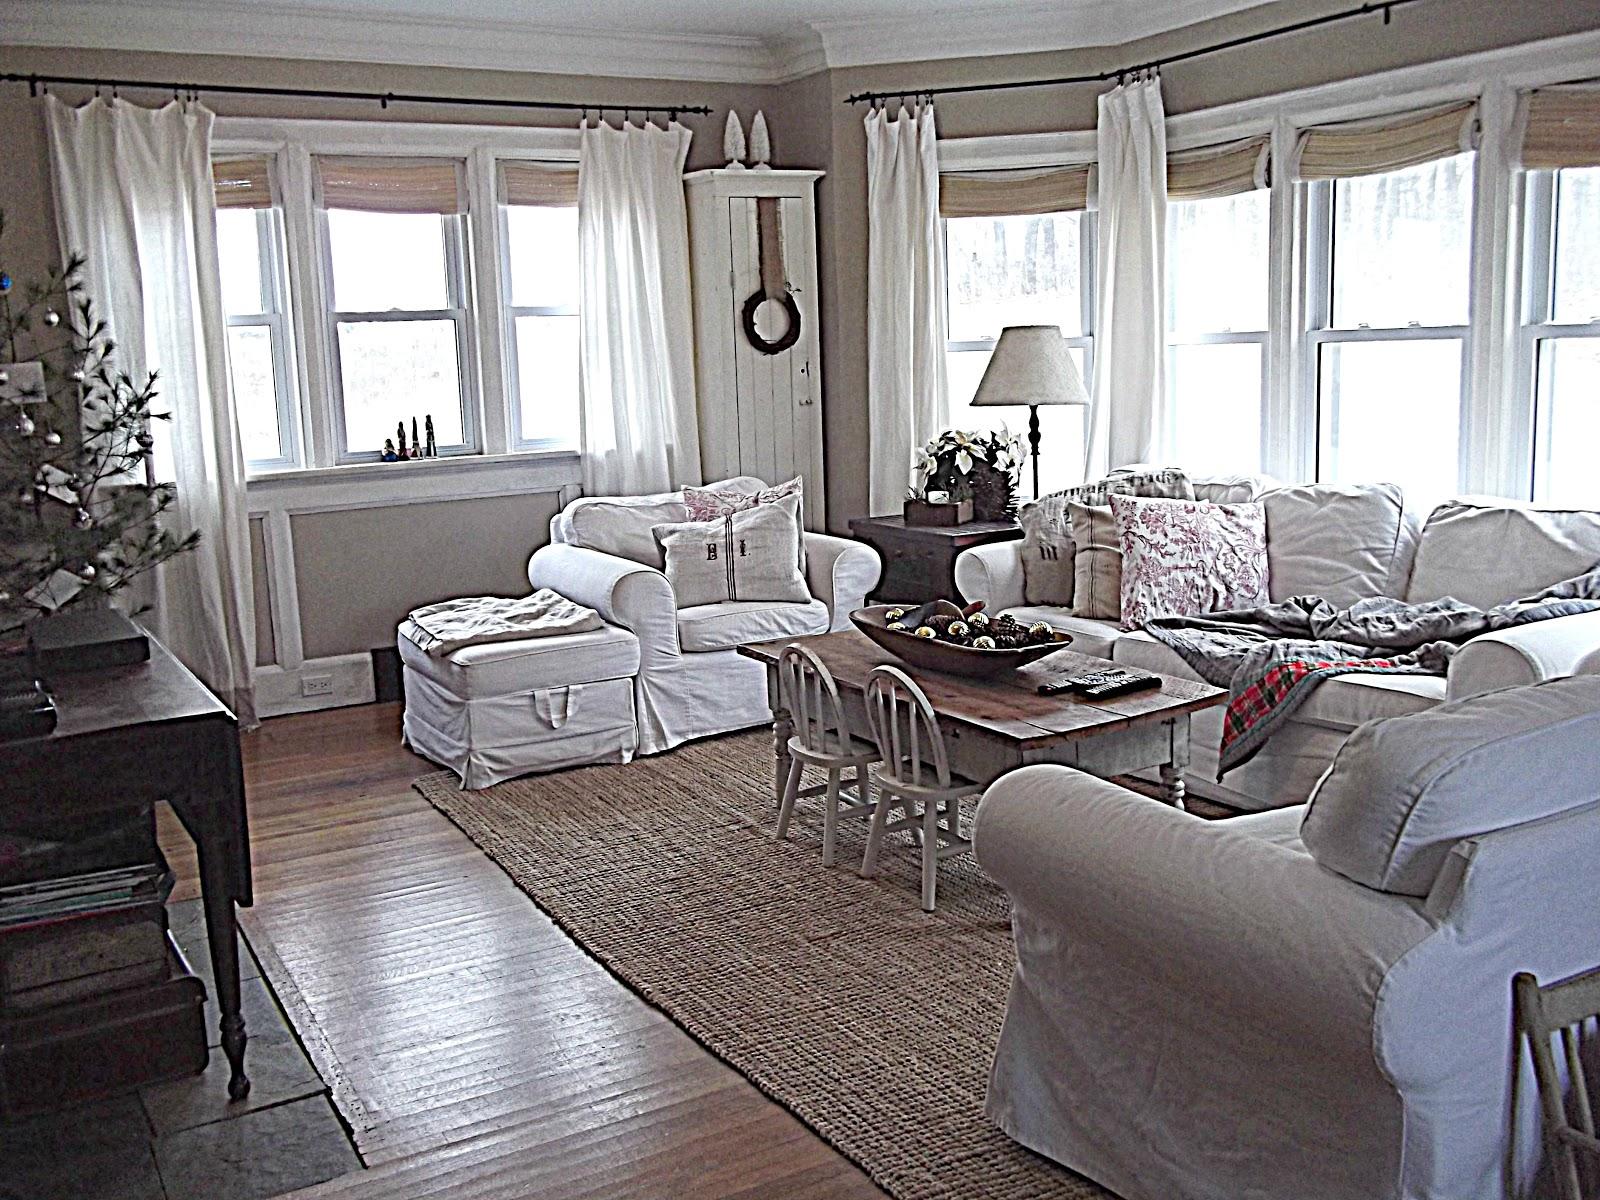 Rustic Farmhouse: Here it is! The SIMPLEST Christmas Tree ... on Farmhouse Living Room Curtain Ideas  id=62090